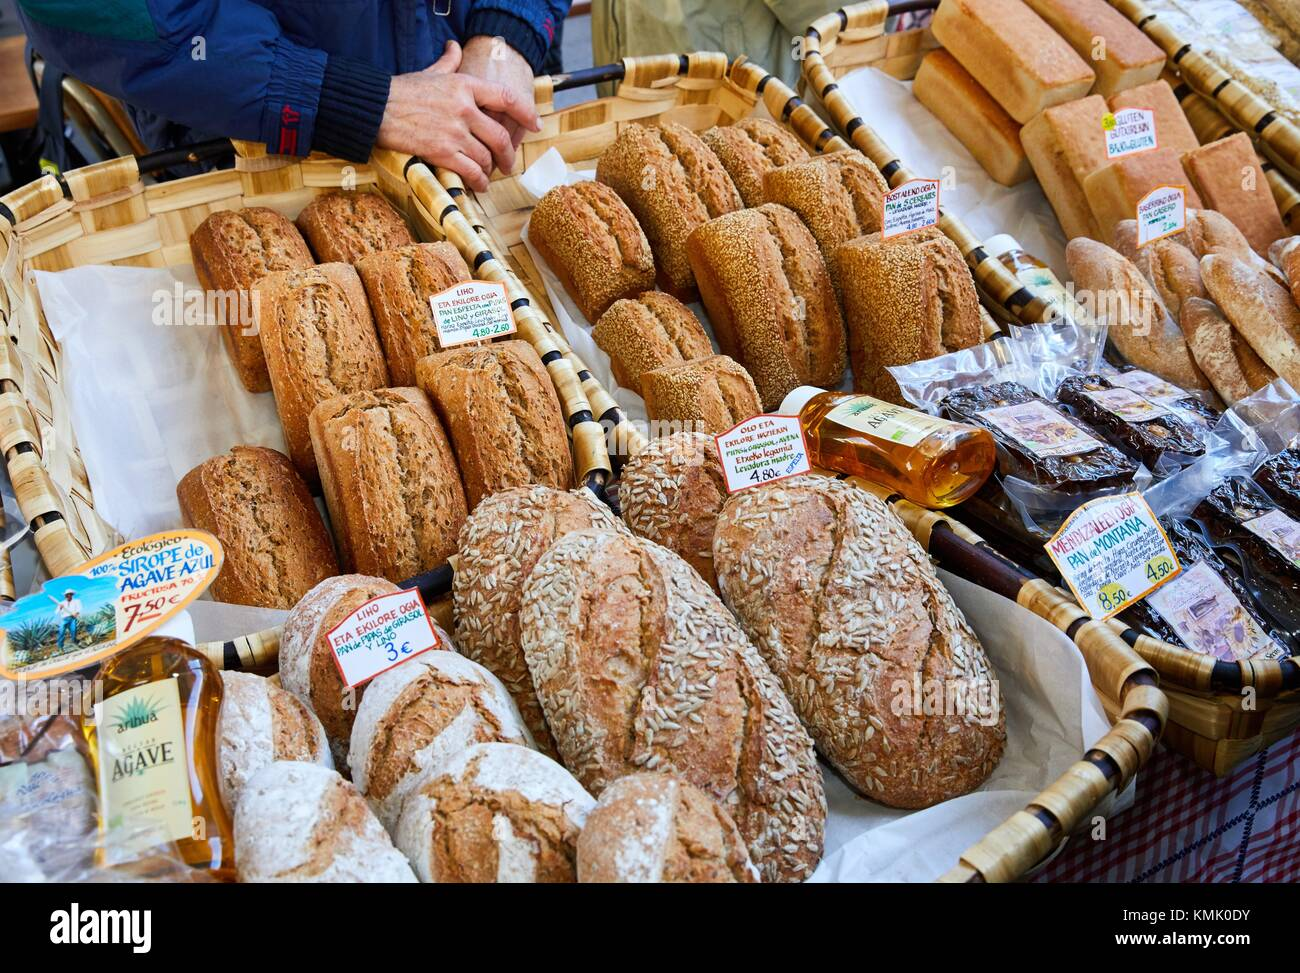 Homemade bread, Ordizia Market, Special Christmas market, Ordizia, Gipuzkoa, Basque Country, Spain, Europe - Stock Image